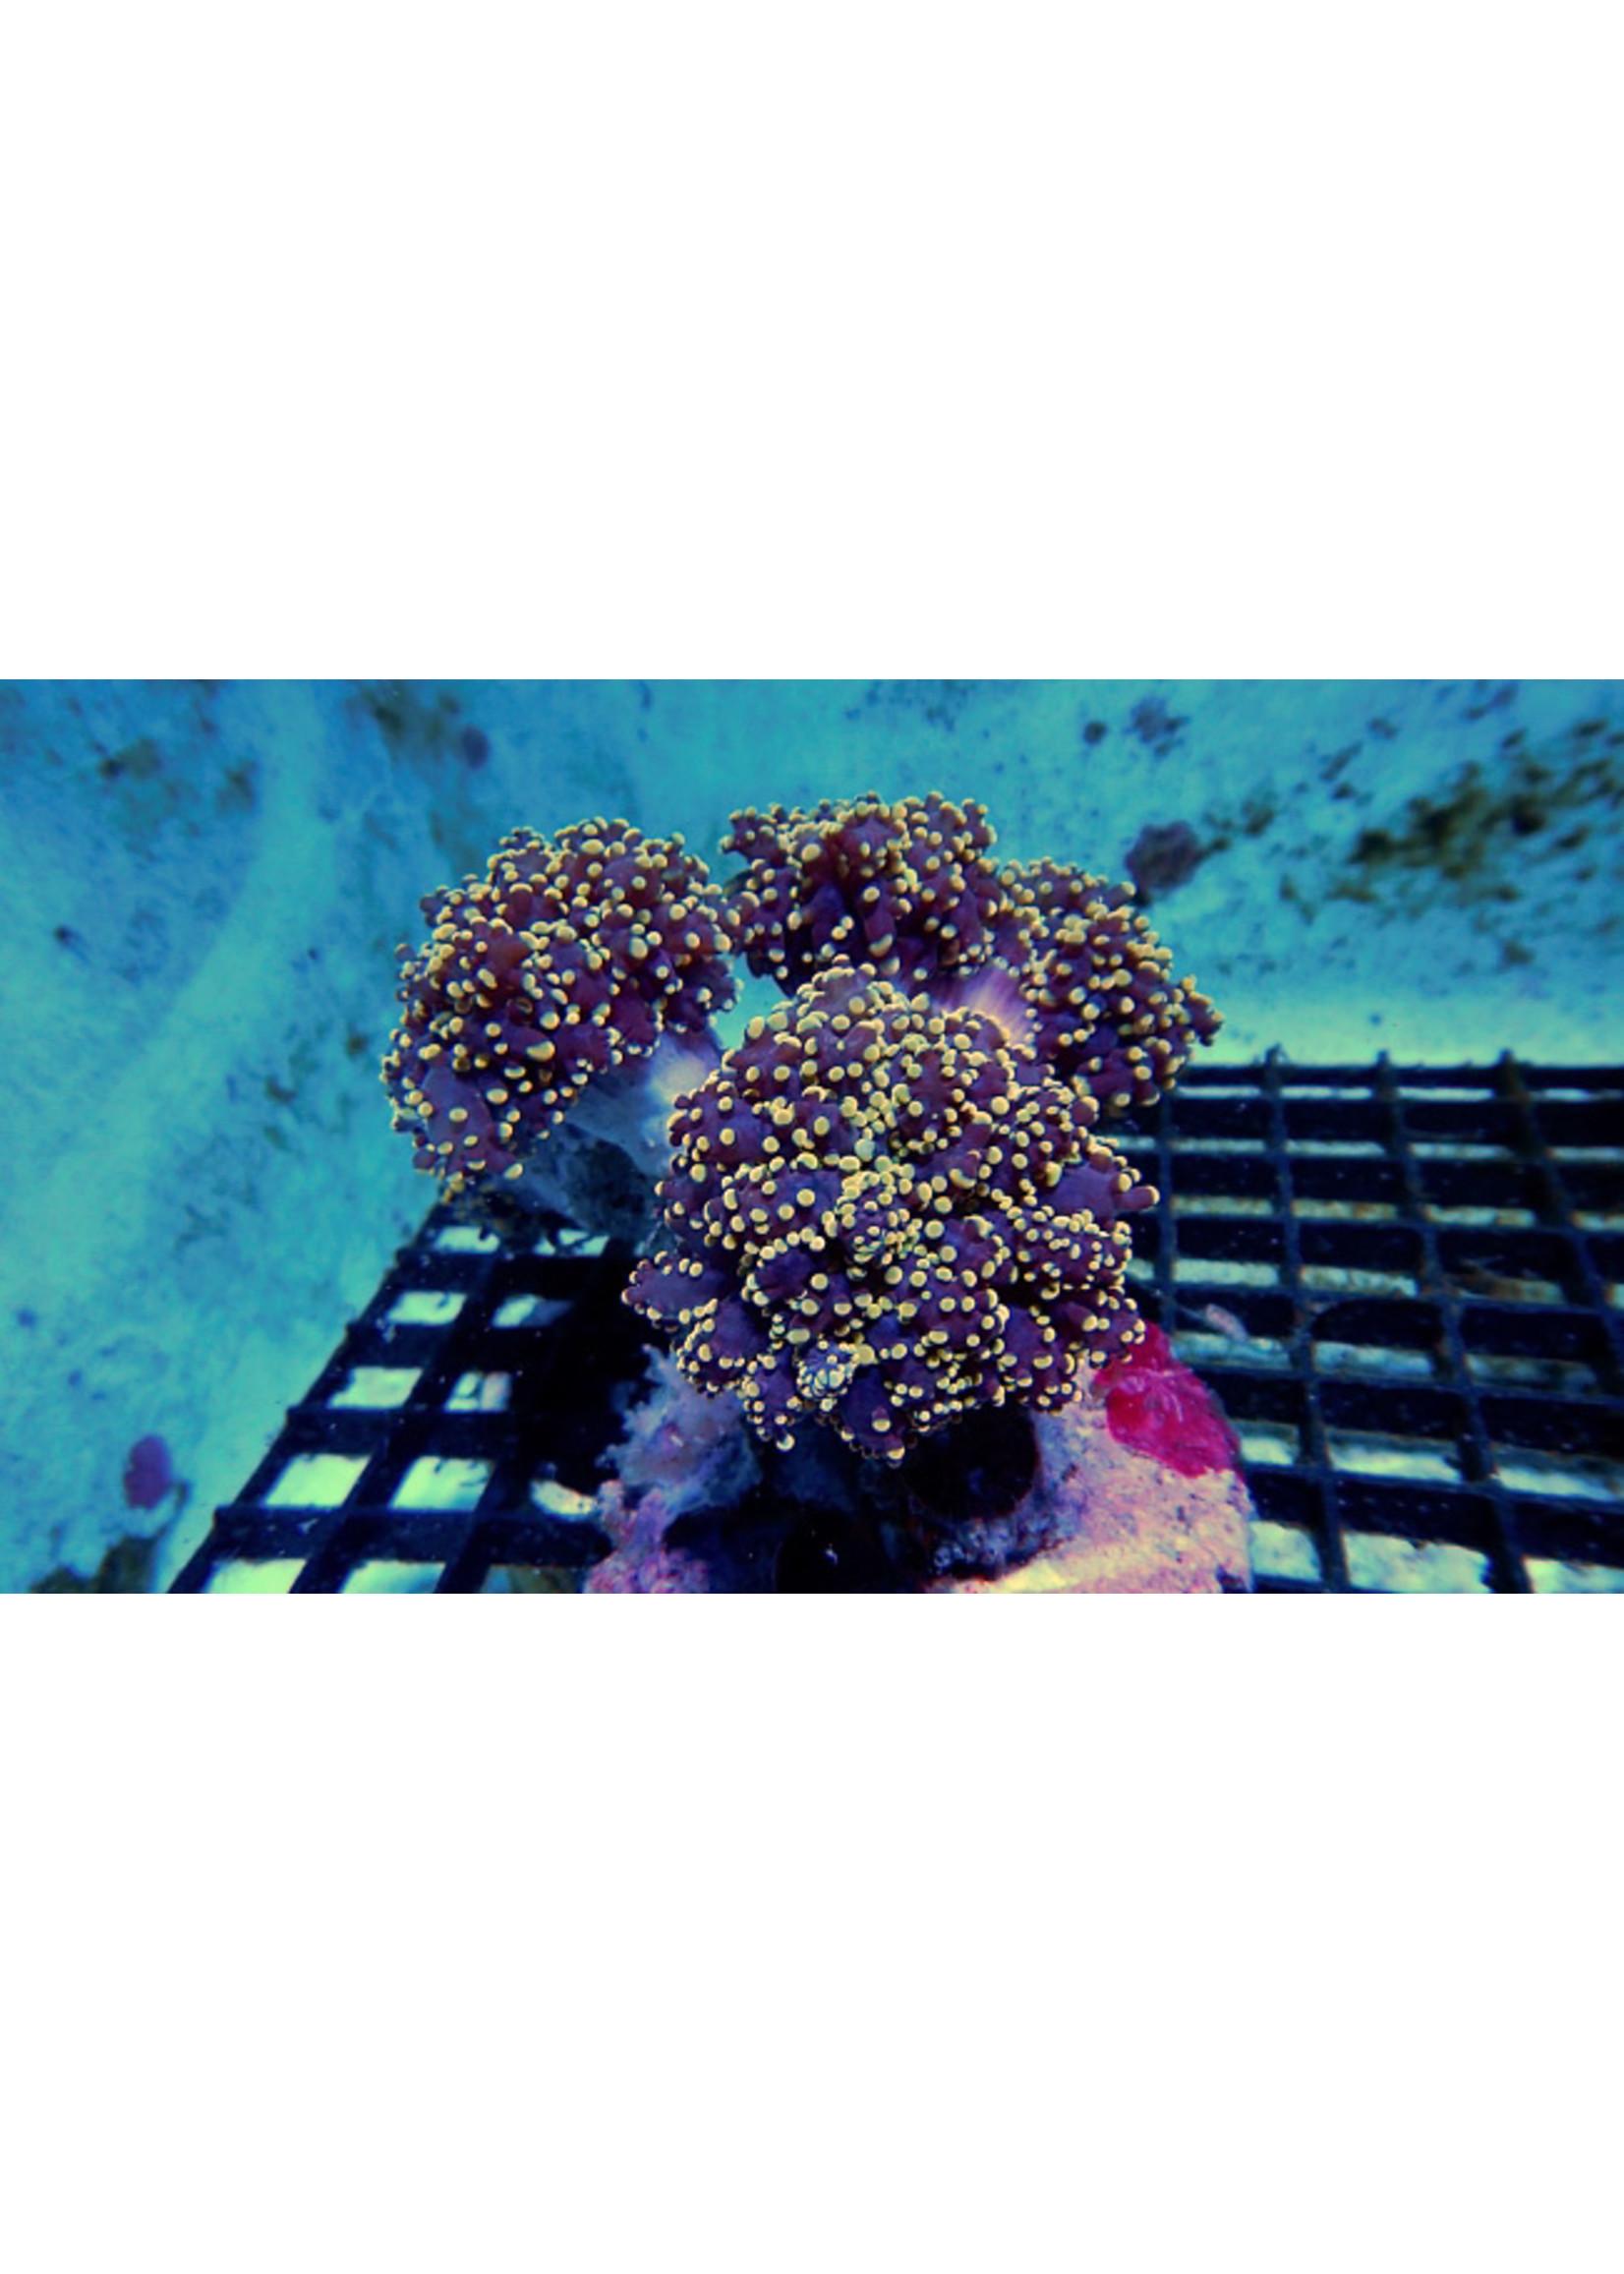 Octospawn Kupang Orange Tip Octospawn Coral  WYSIWYG